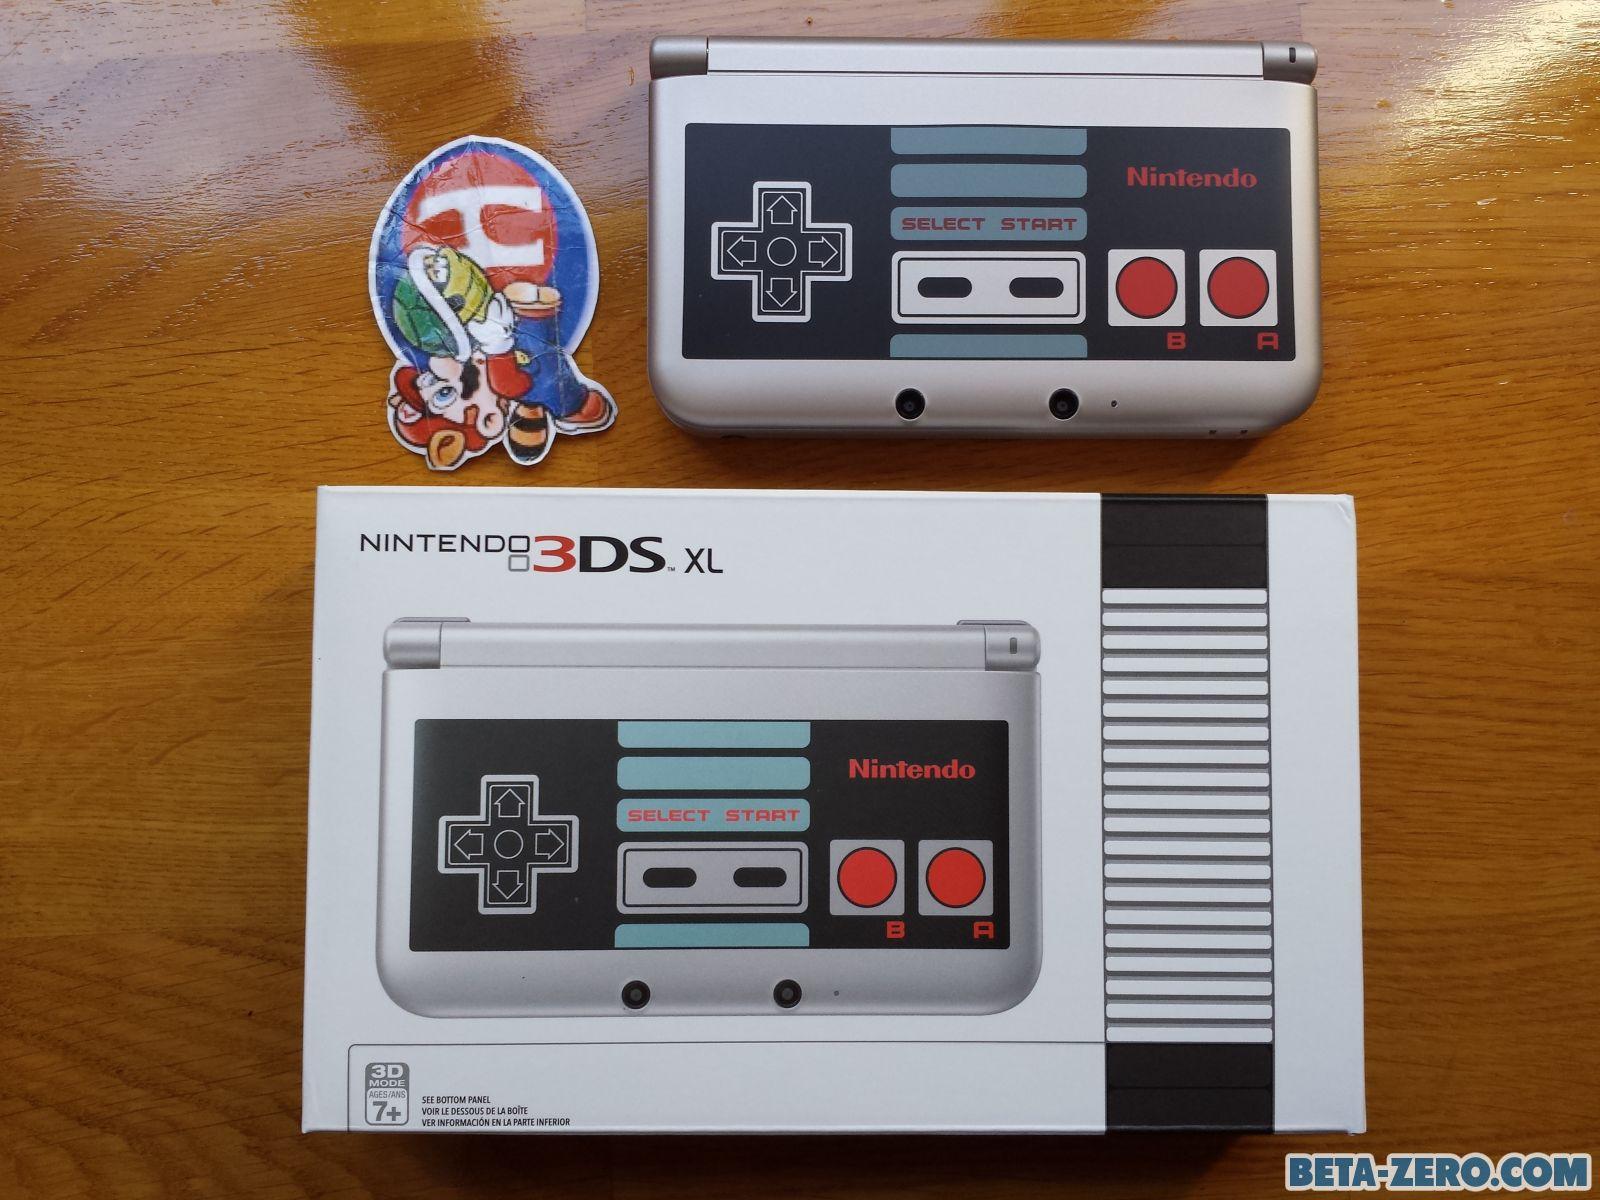 3DS XL Nes Edition.